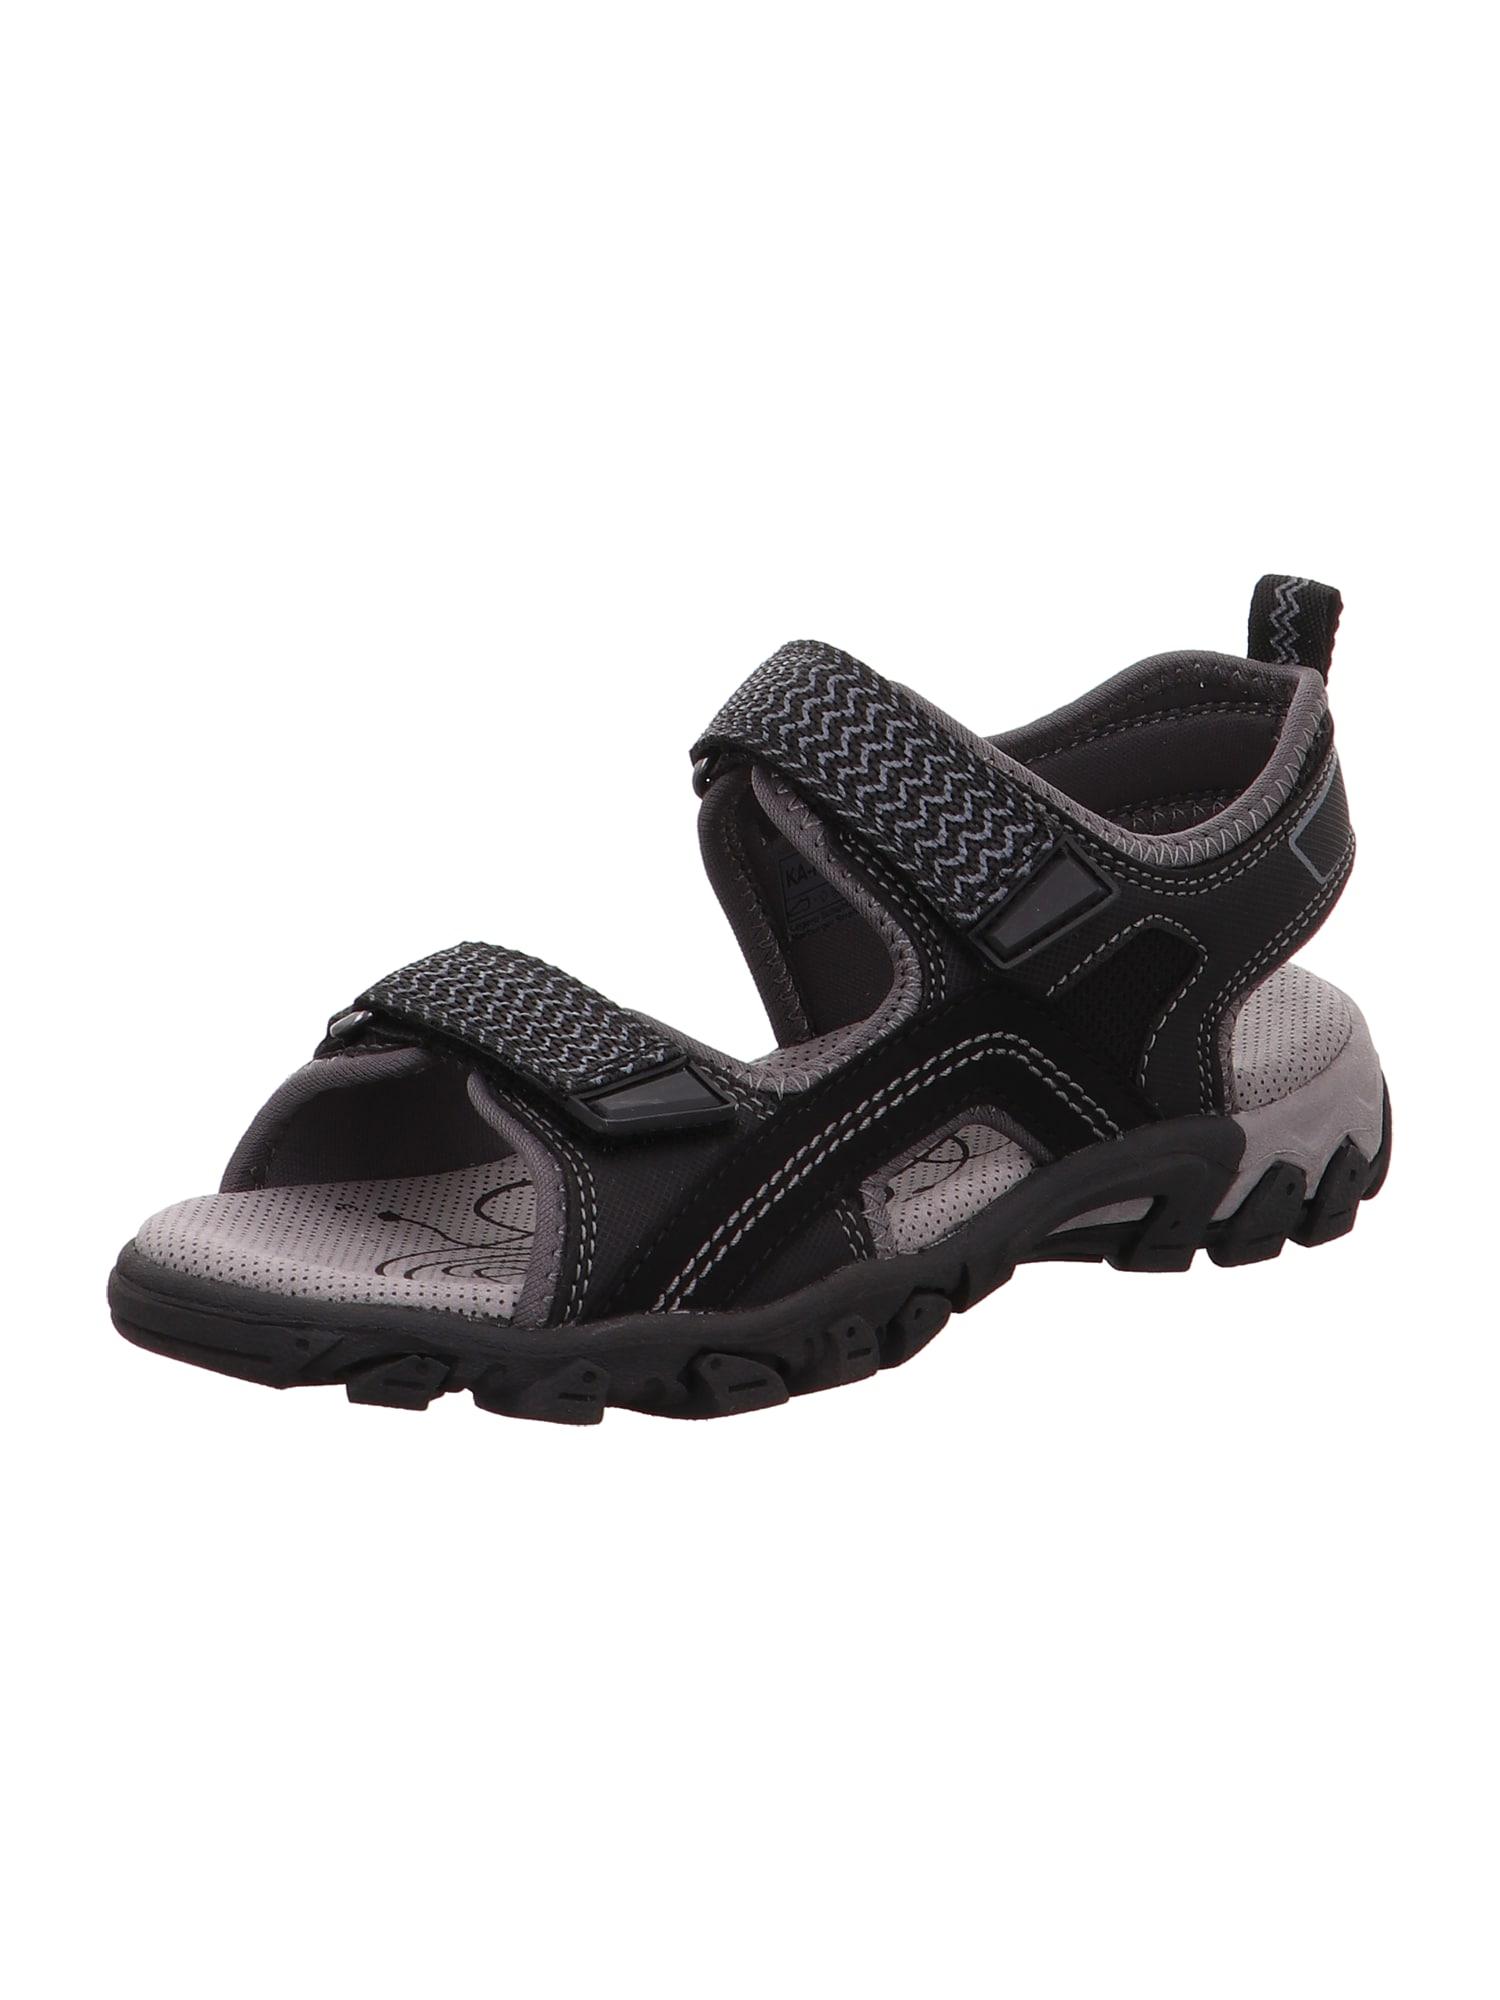 SUPERFIT Atviri batai 'HIKE' juoda